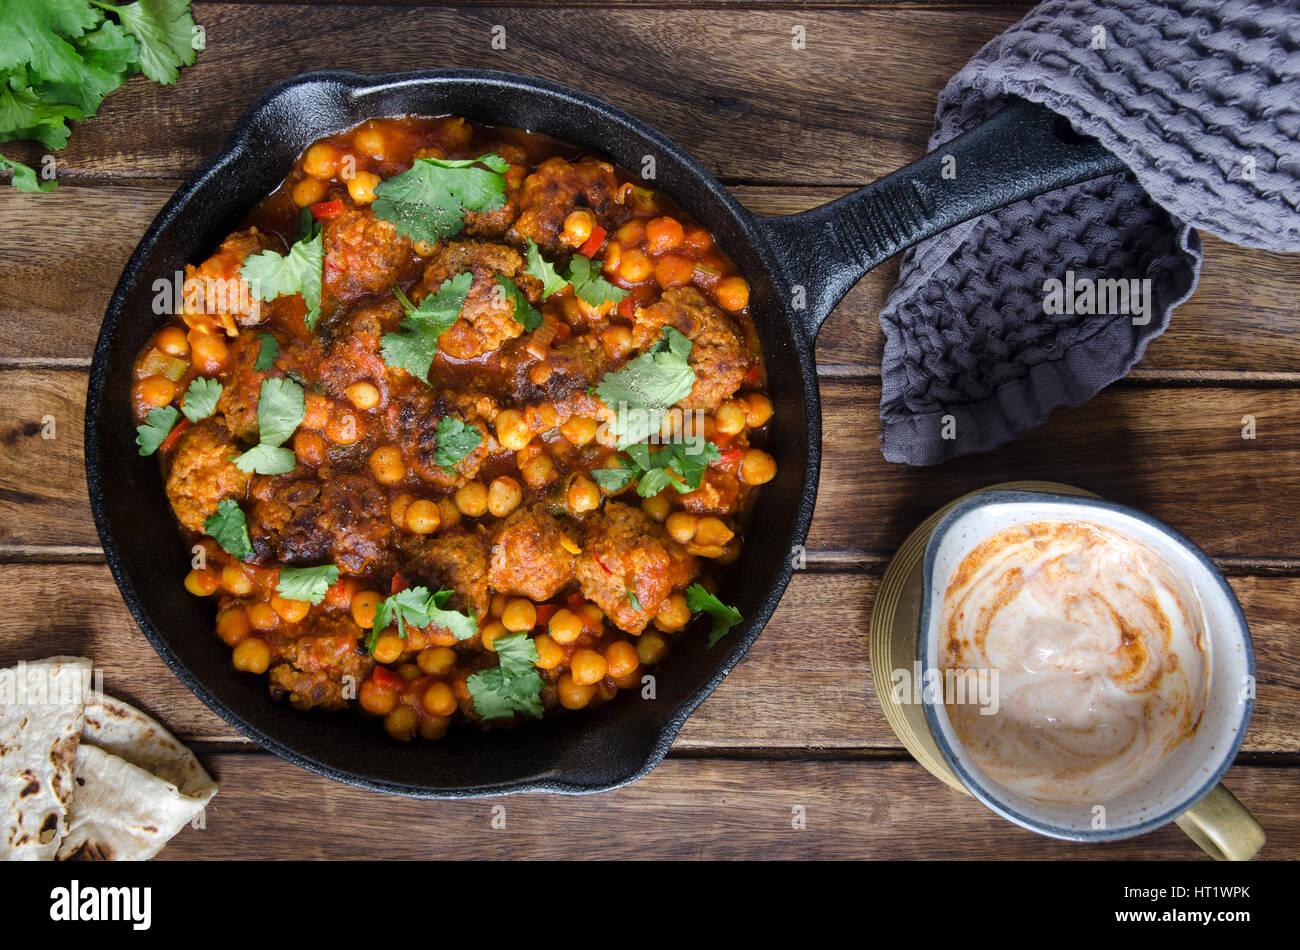 Pork meatballs with chickpeas and harissa yoghurt - Stock Image